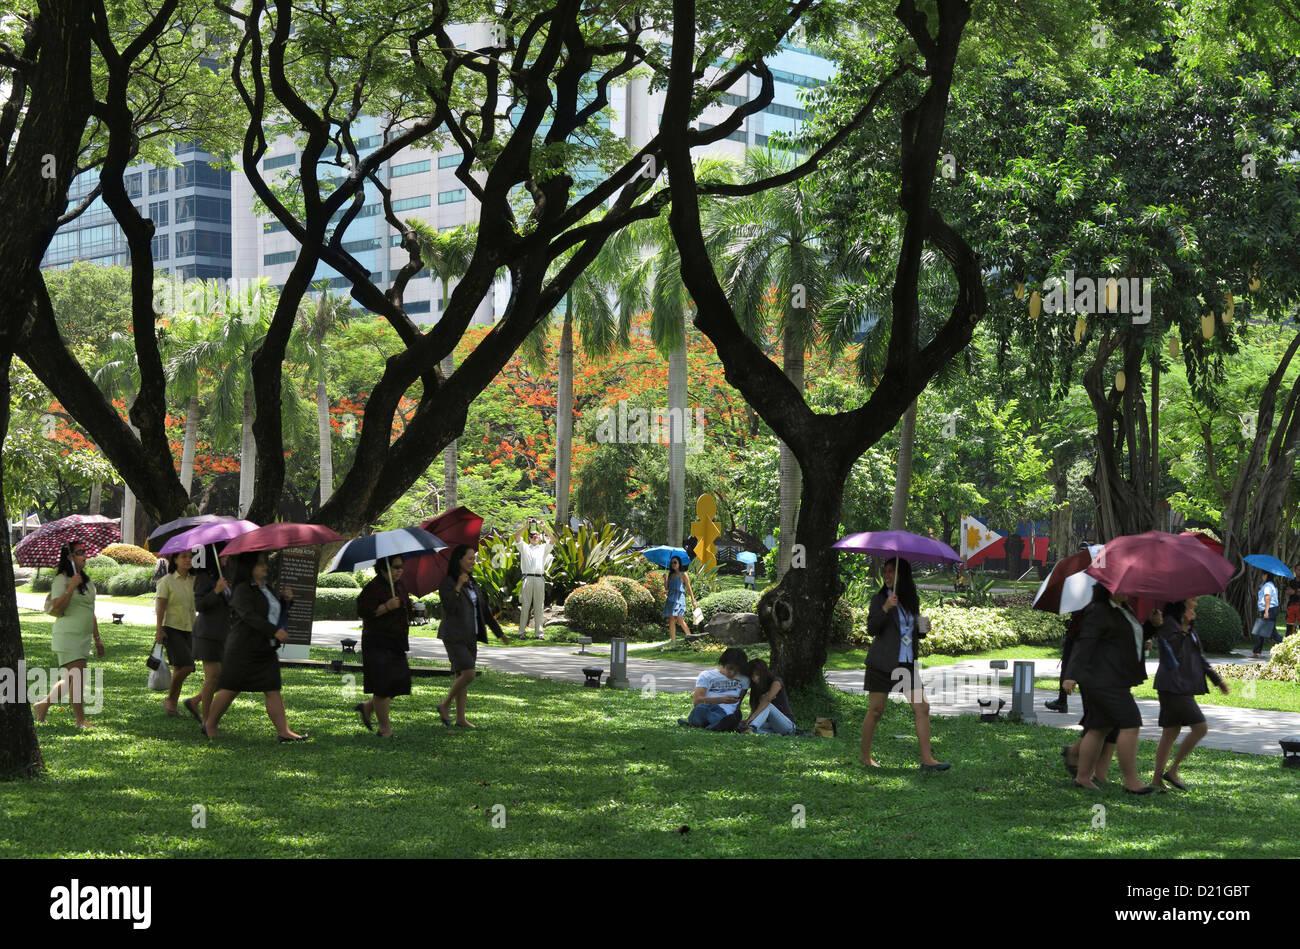 Frauen mit Sonnenschirmen, Ayala Triangle Park in Makati City, Insel Luzon, Philippinen, Asien Stockbild